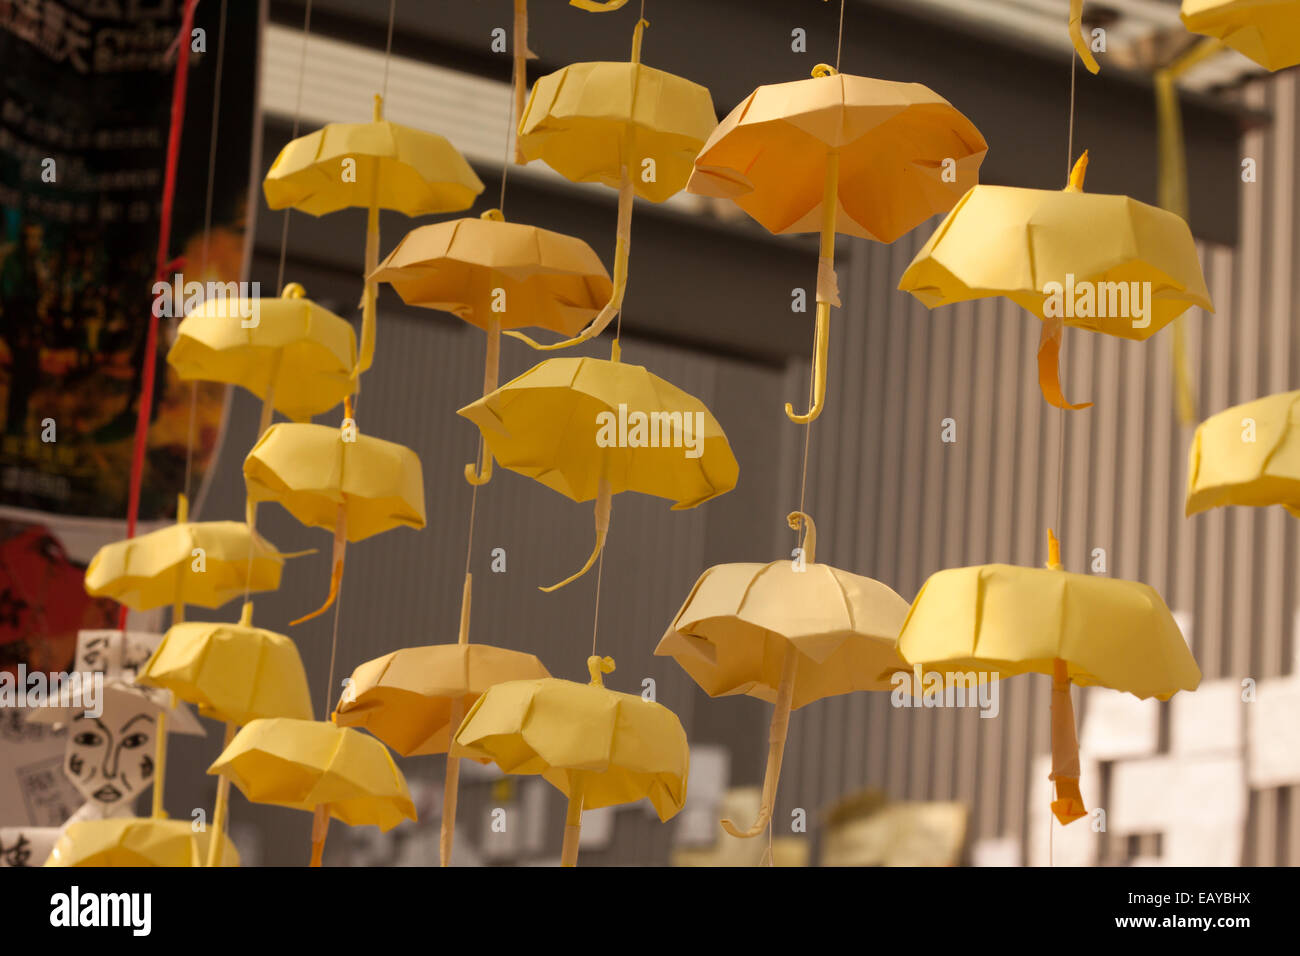 Yellow umbrellas, symbol of Occupy Central - Stock Image